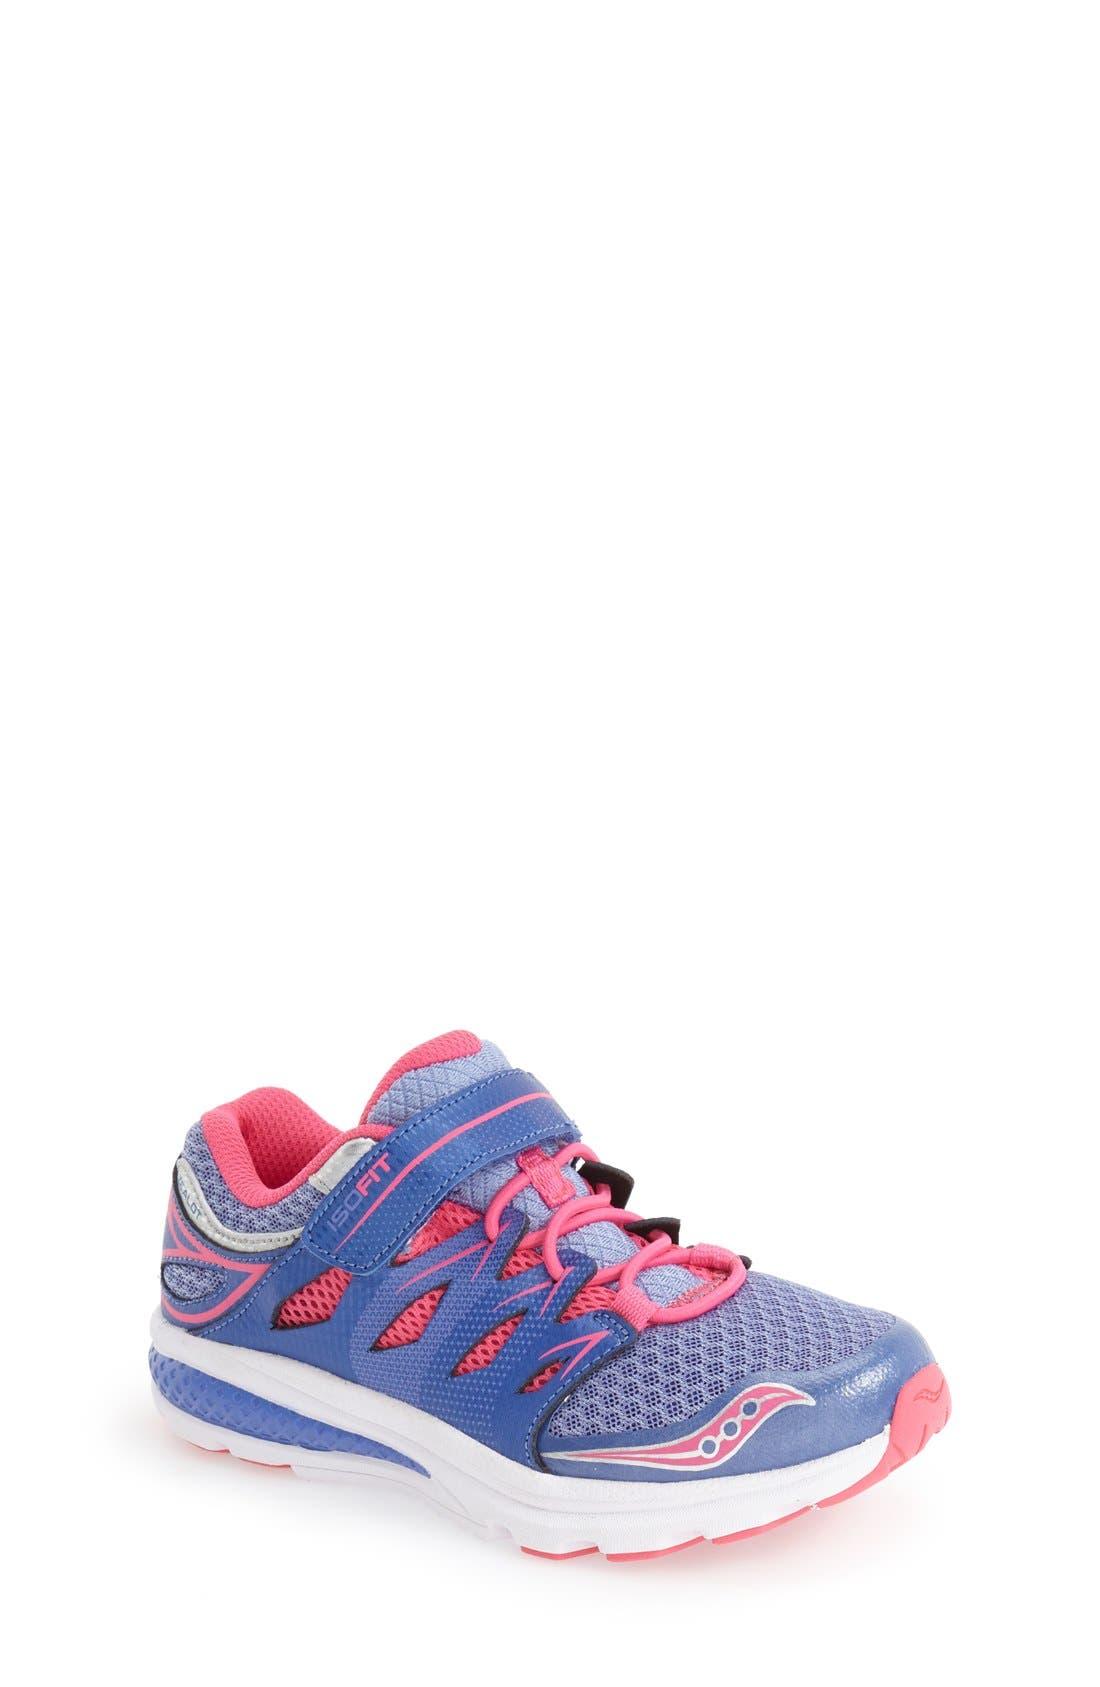 'Zealot 2 AC' Sneaker,                             Main thumbnail 1, color,                             400